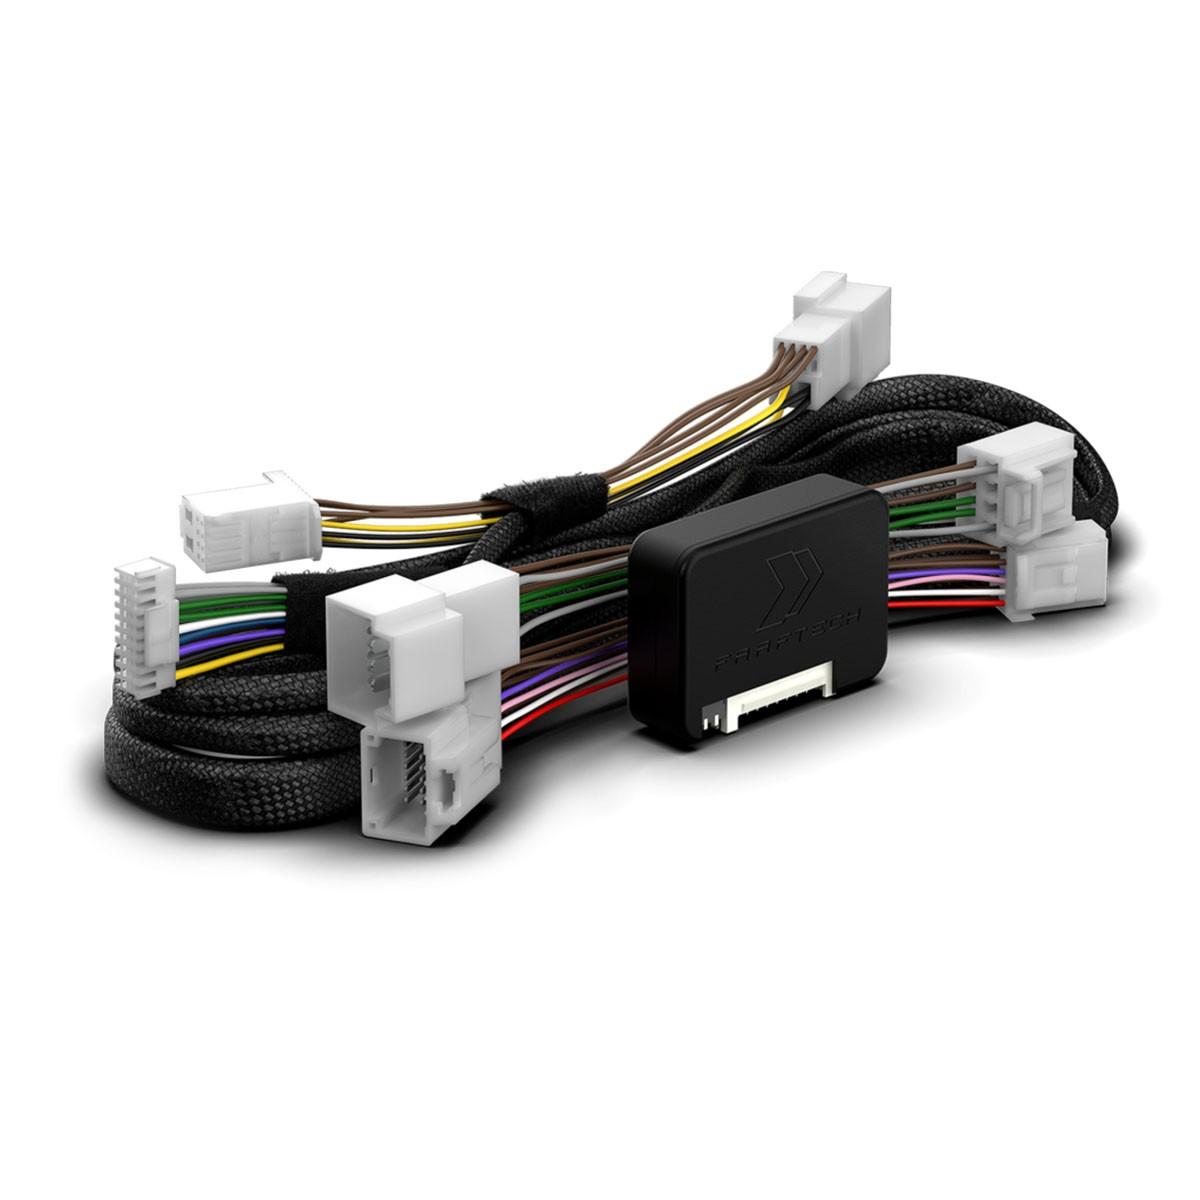 Modulo Vidro Eletrico 4 PortasToyota Etios 2015 a 2020 Faaftech FT-AC-TY4.4